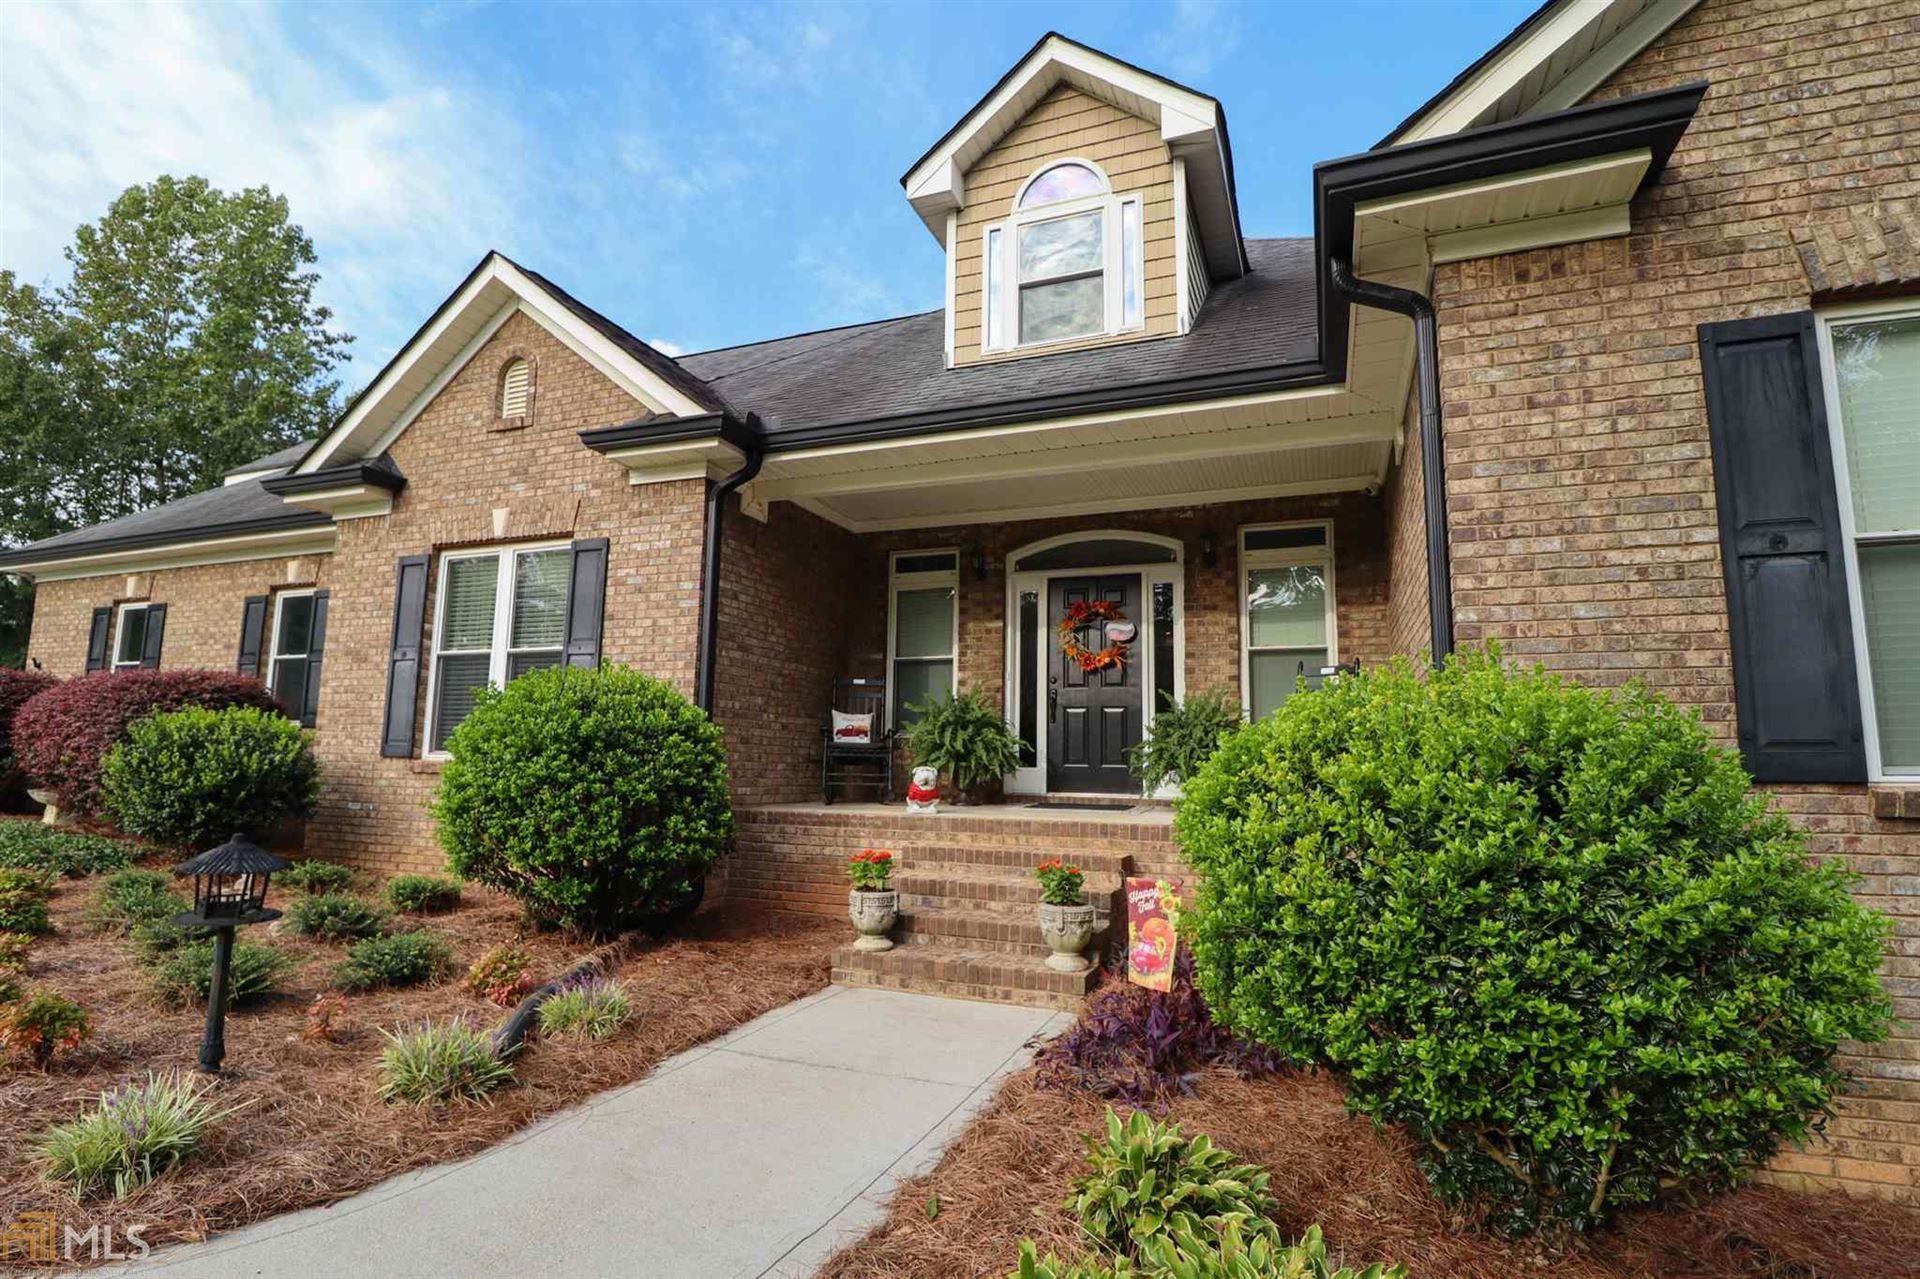 125 Mackey Rd, McDonough, GA 30252 - MLS#: 8869150